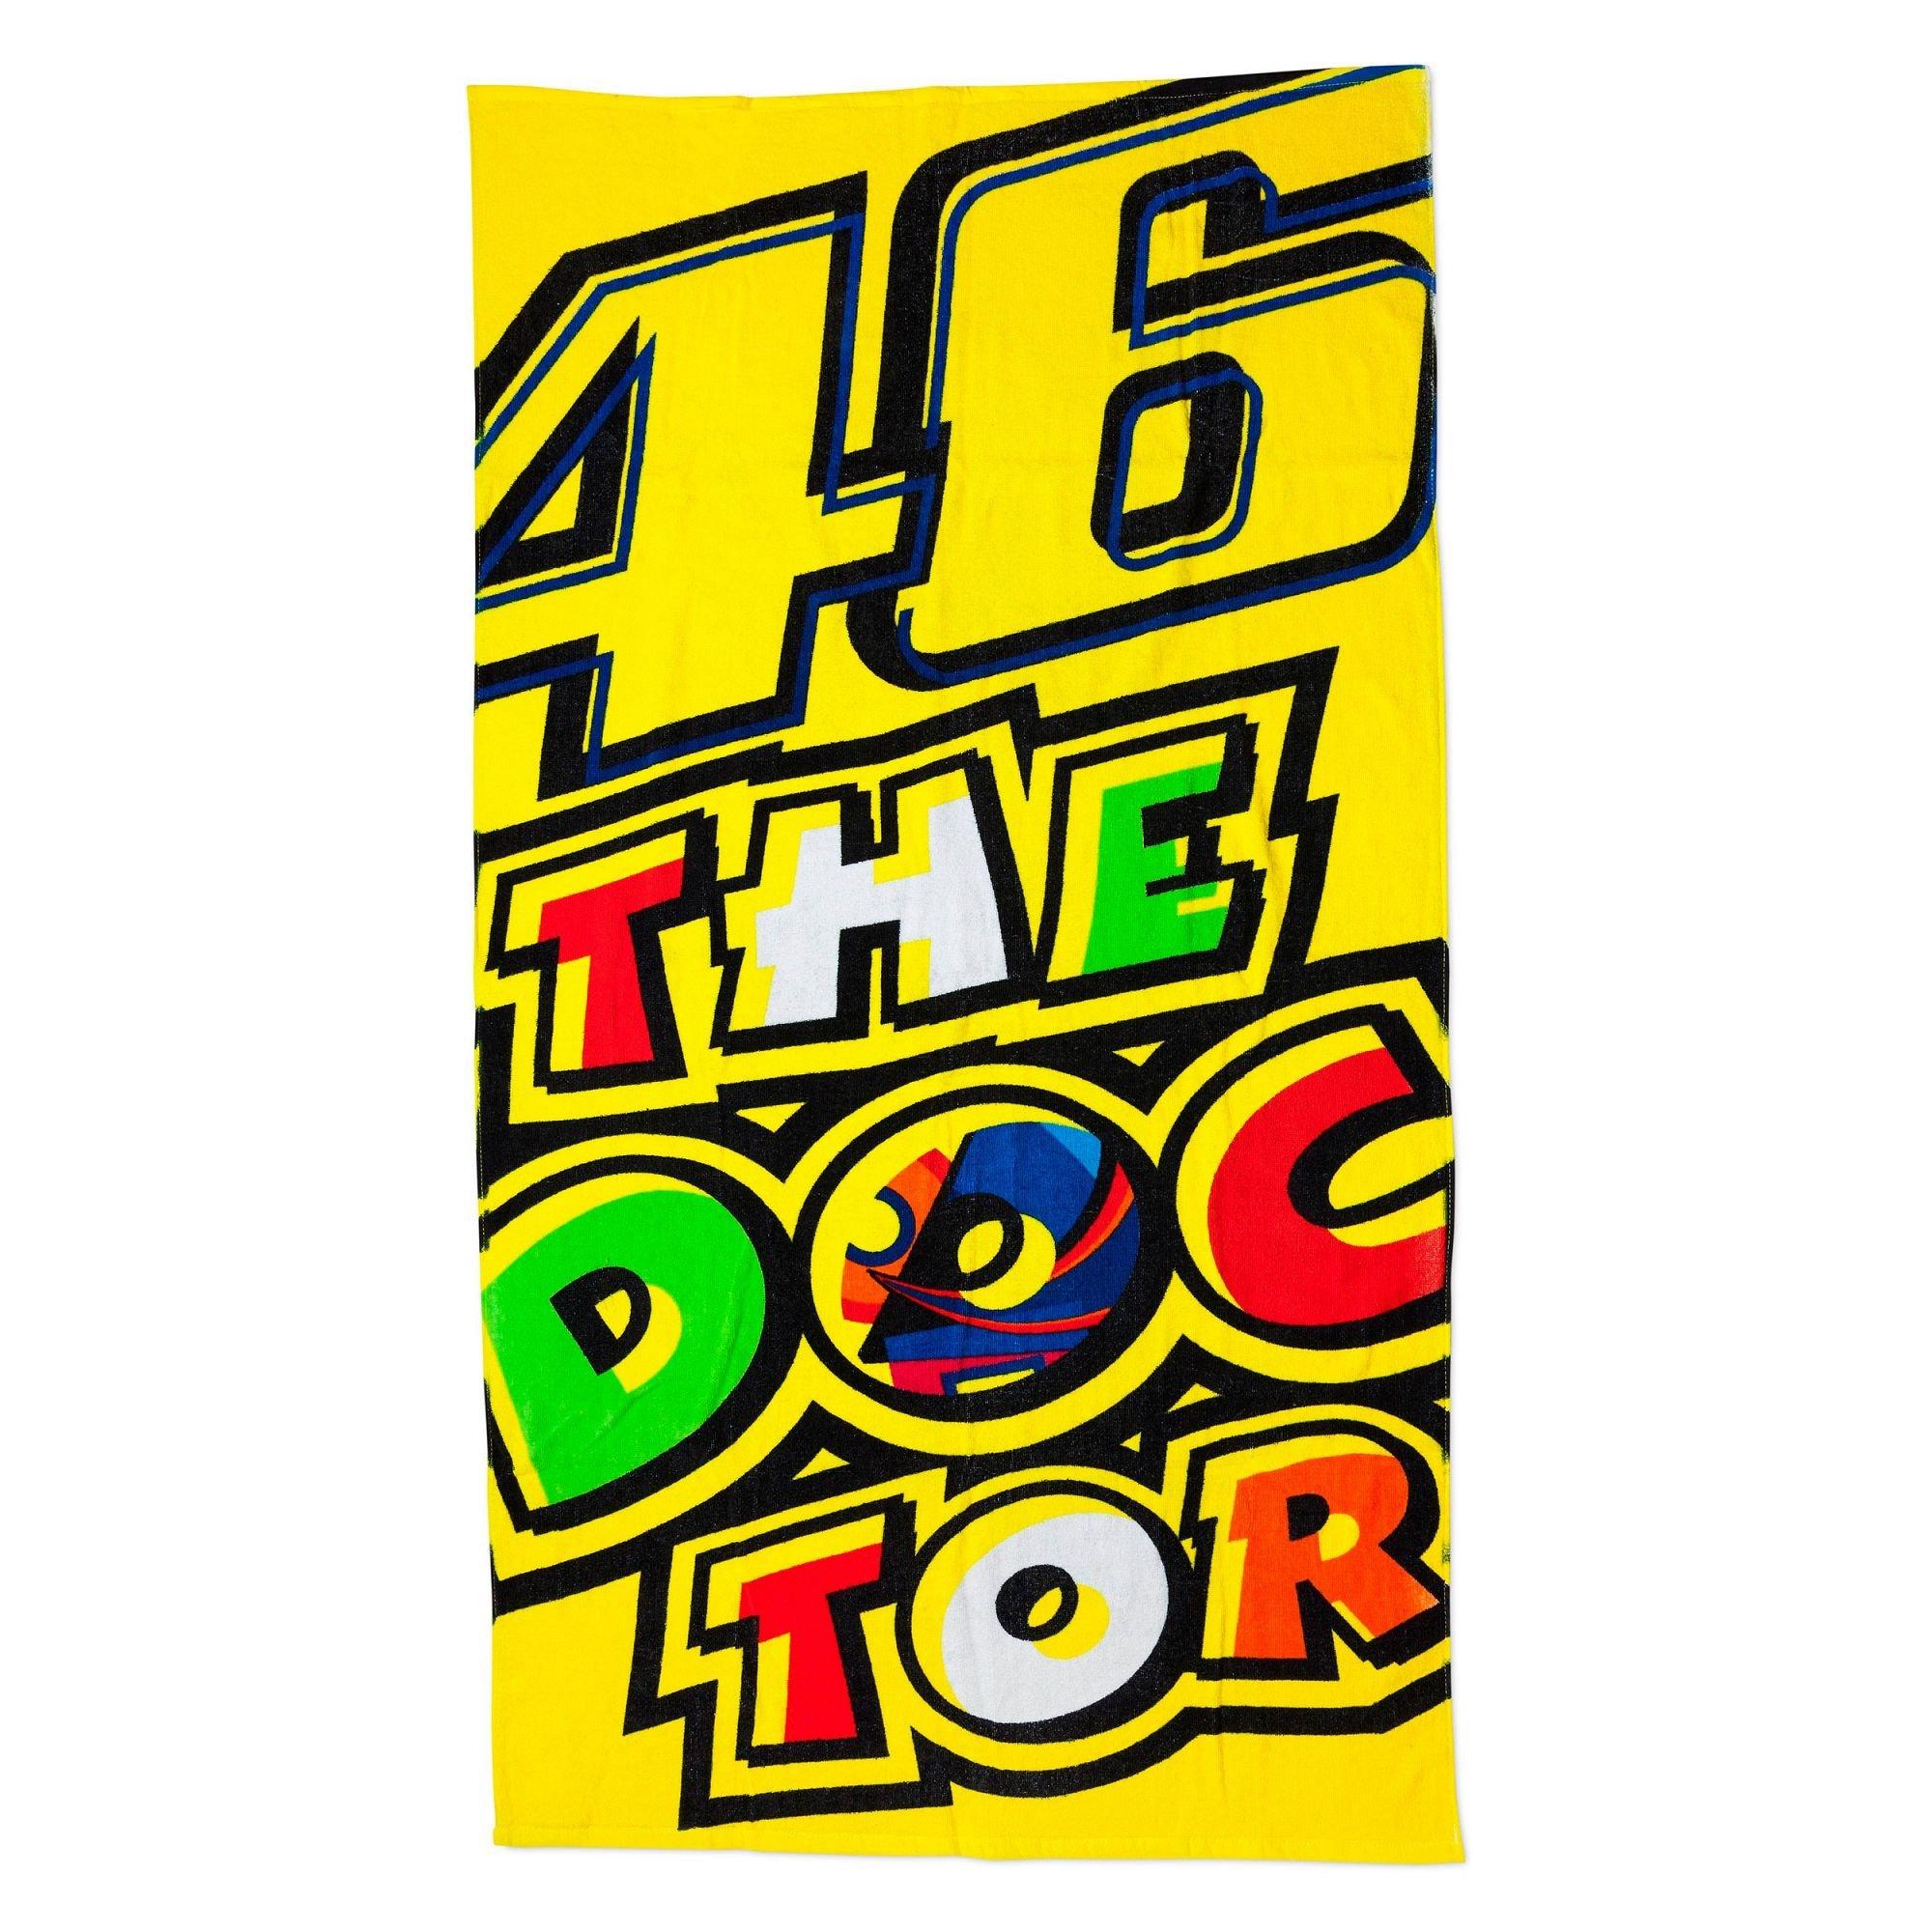 Vr46 Osuška 46 The Doctor